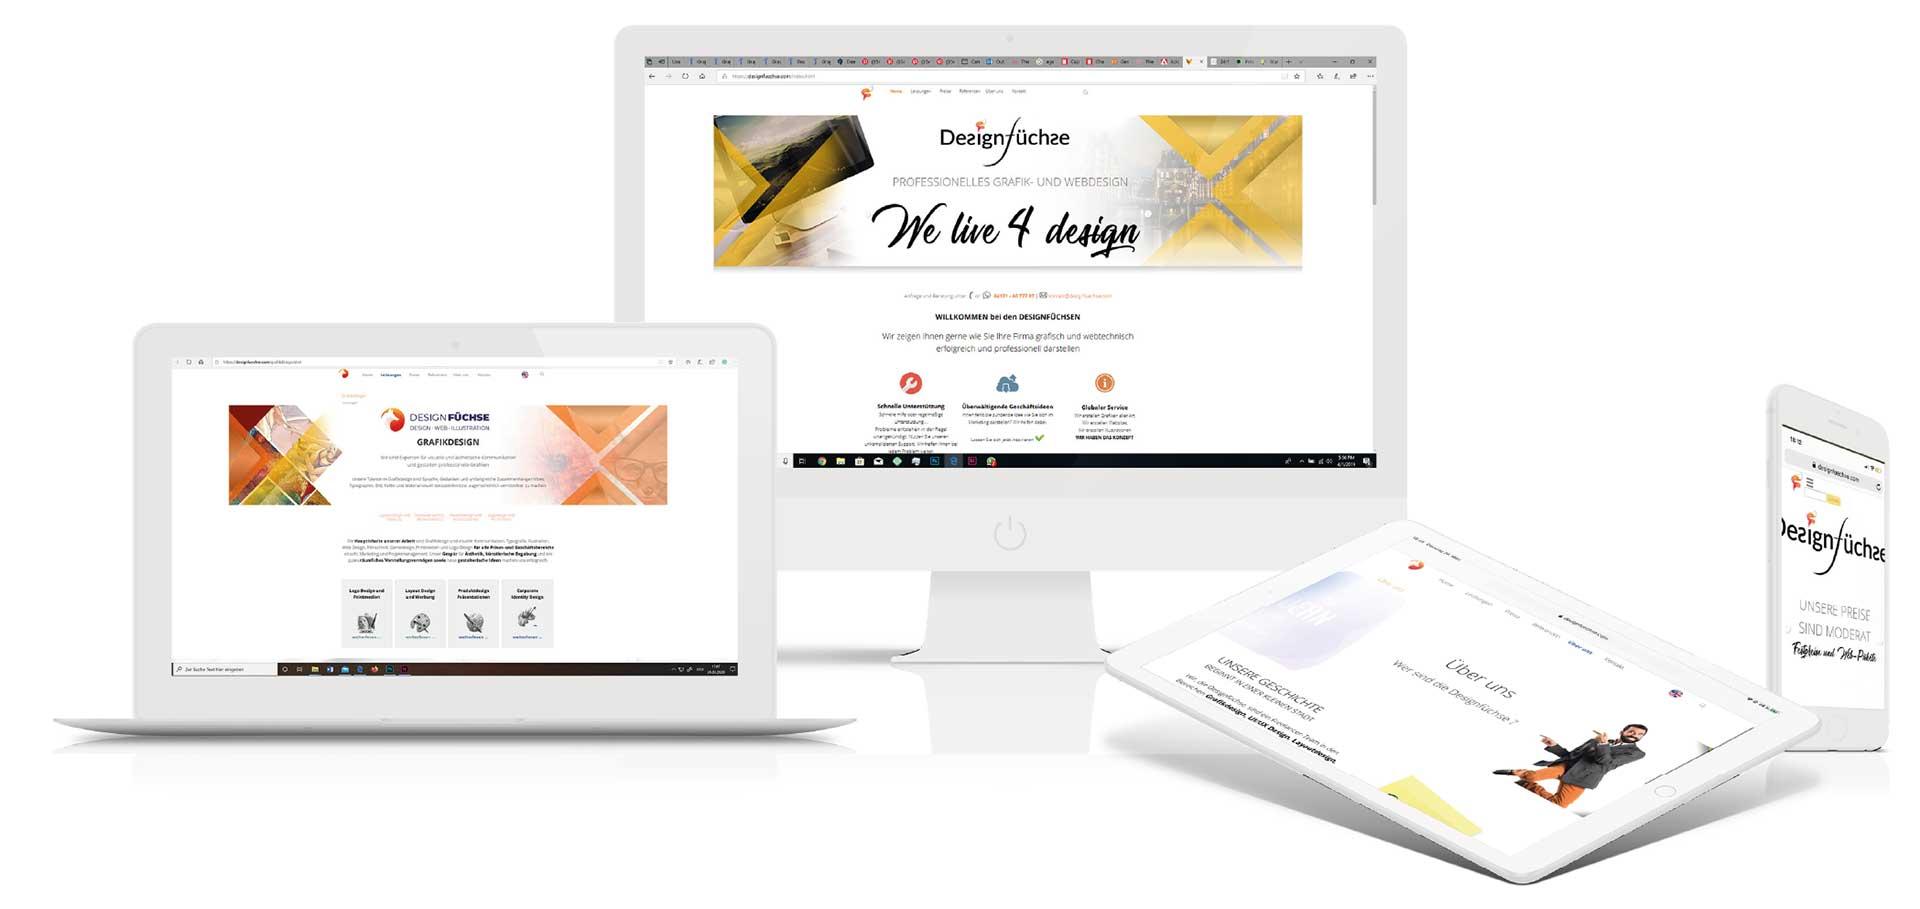 Webprojekt-Designfuechse-Website-X5